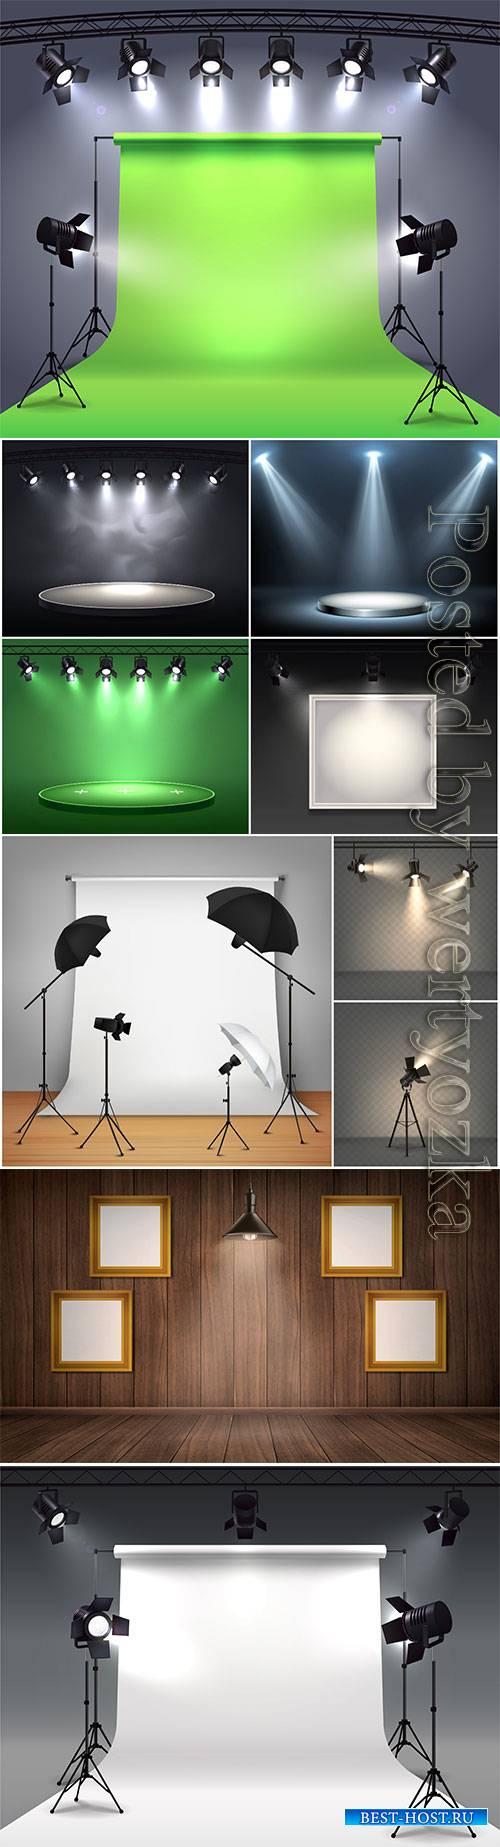 Spotlights realistic vector composition